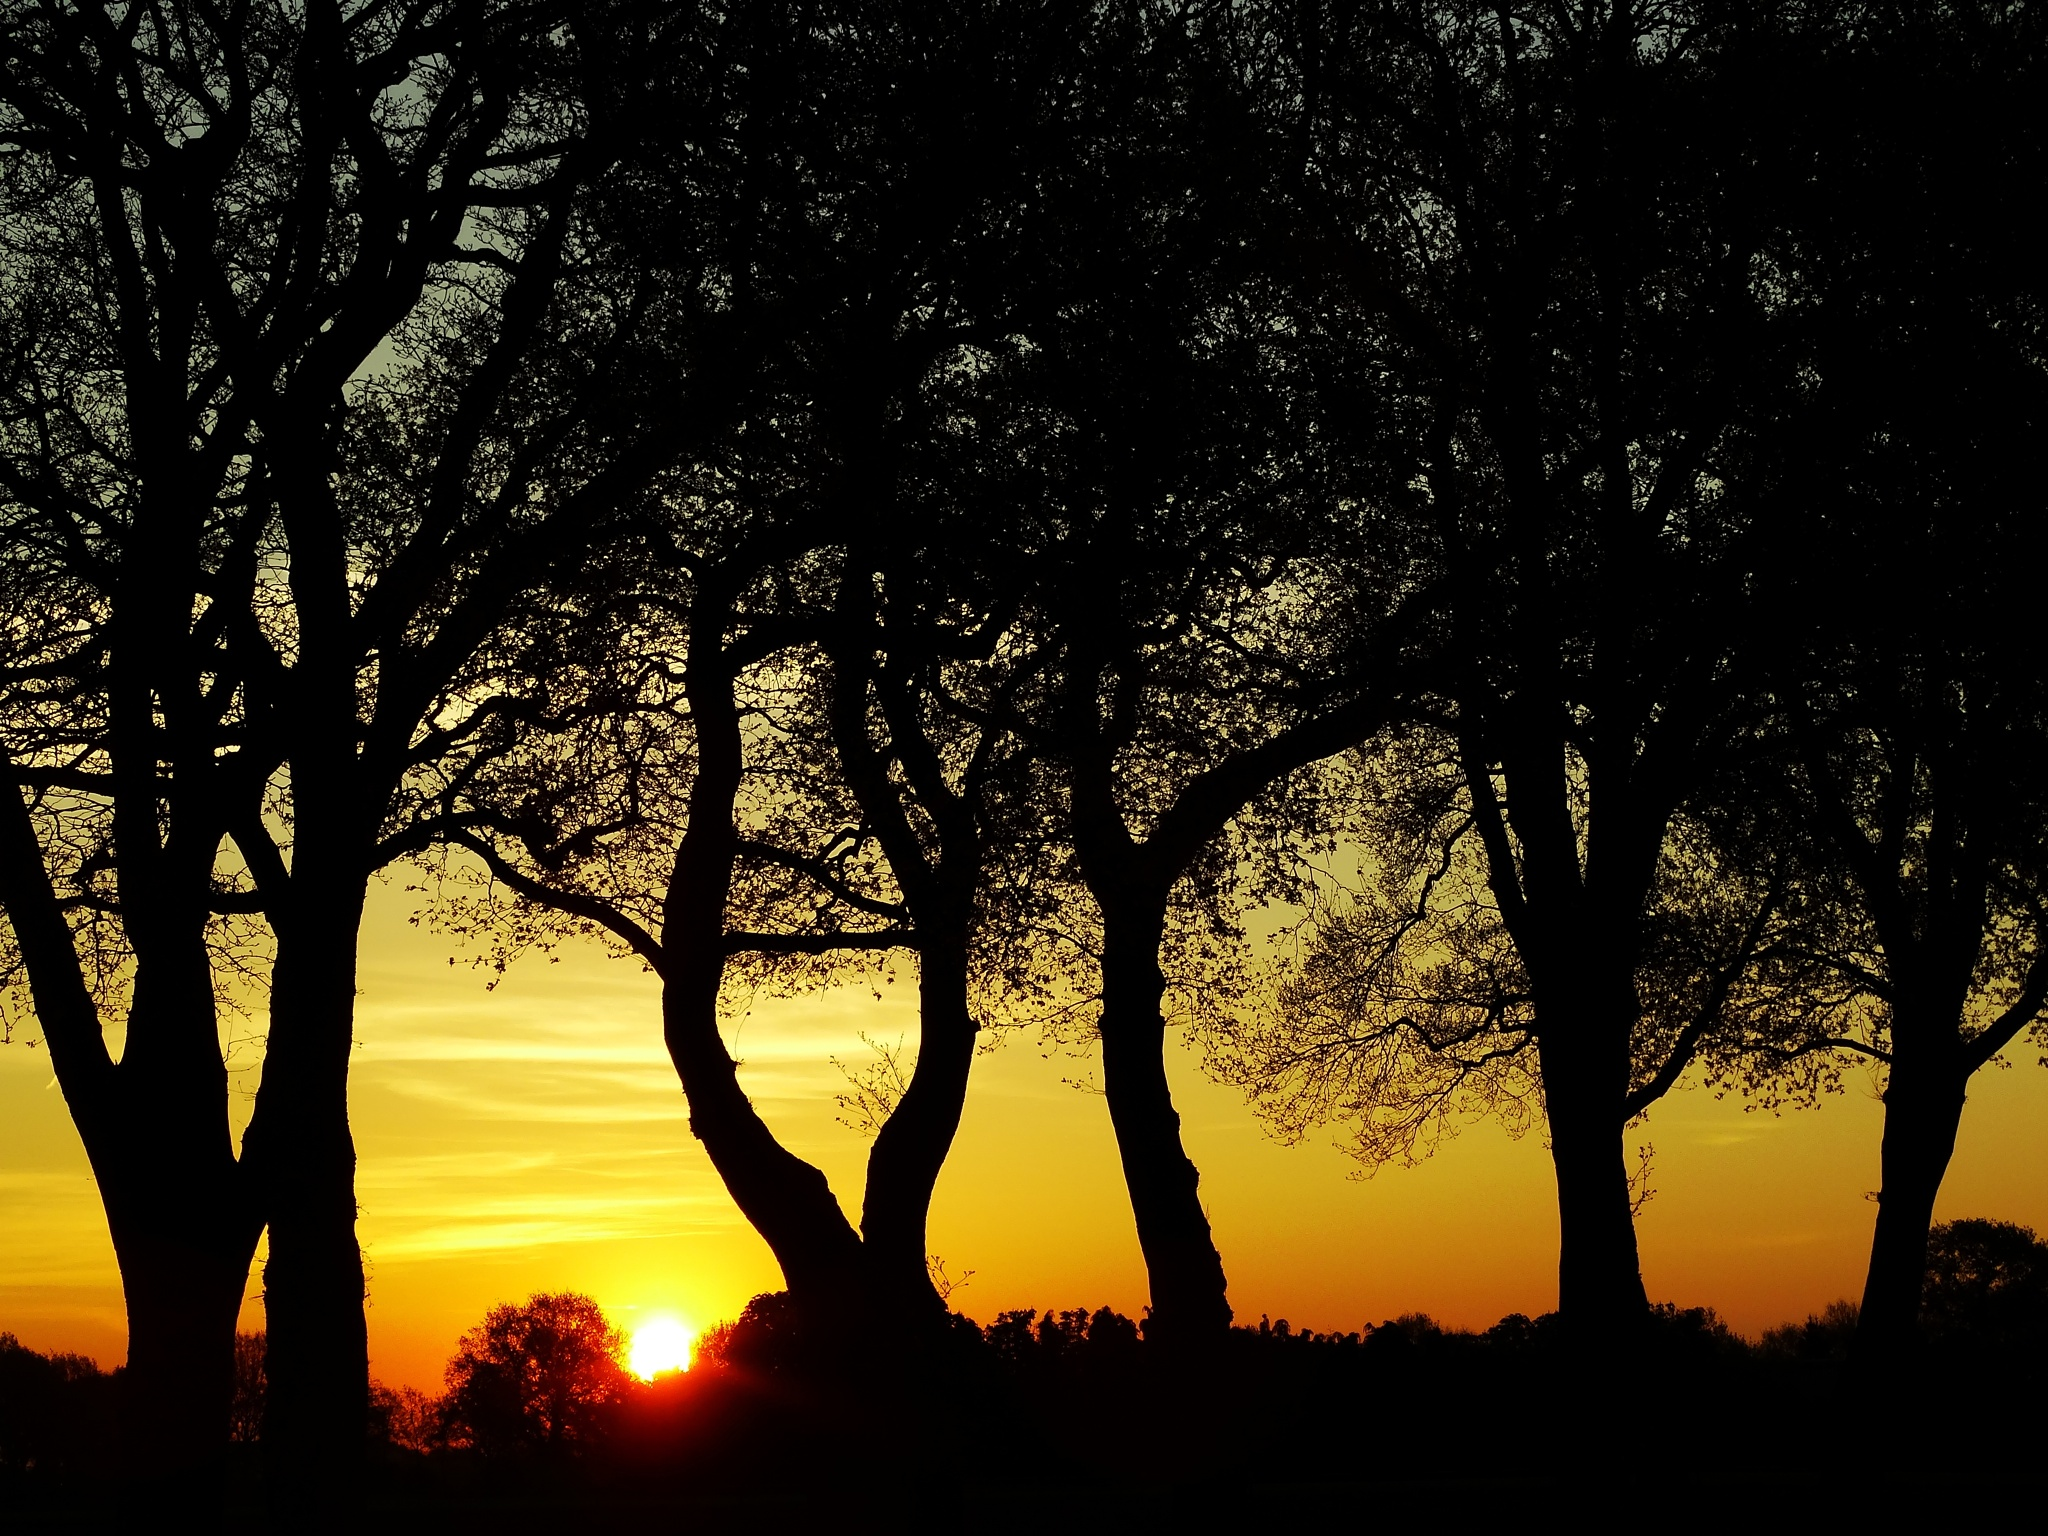 Sunset  by GertdeVos